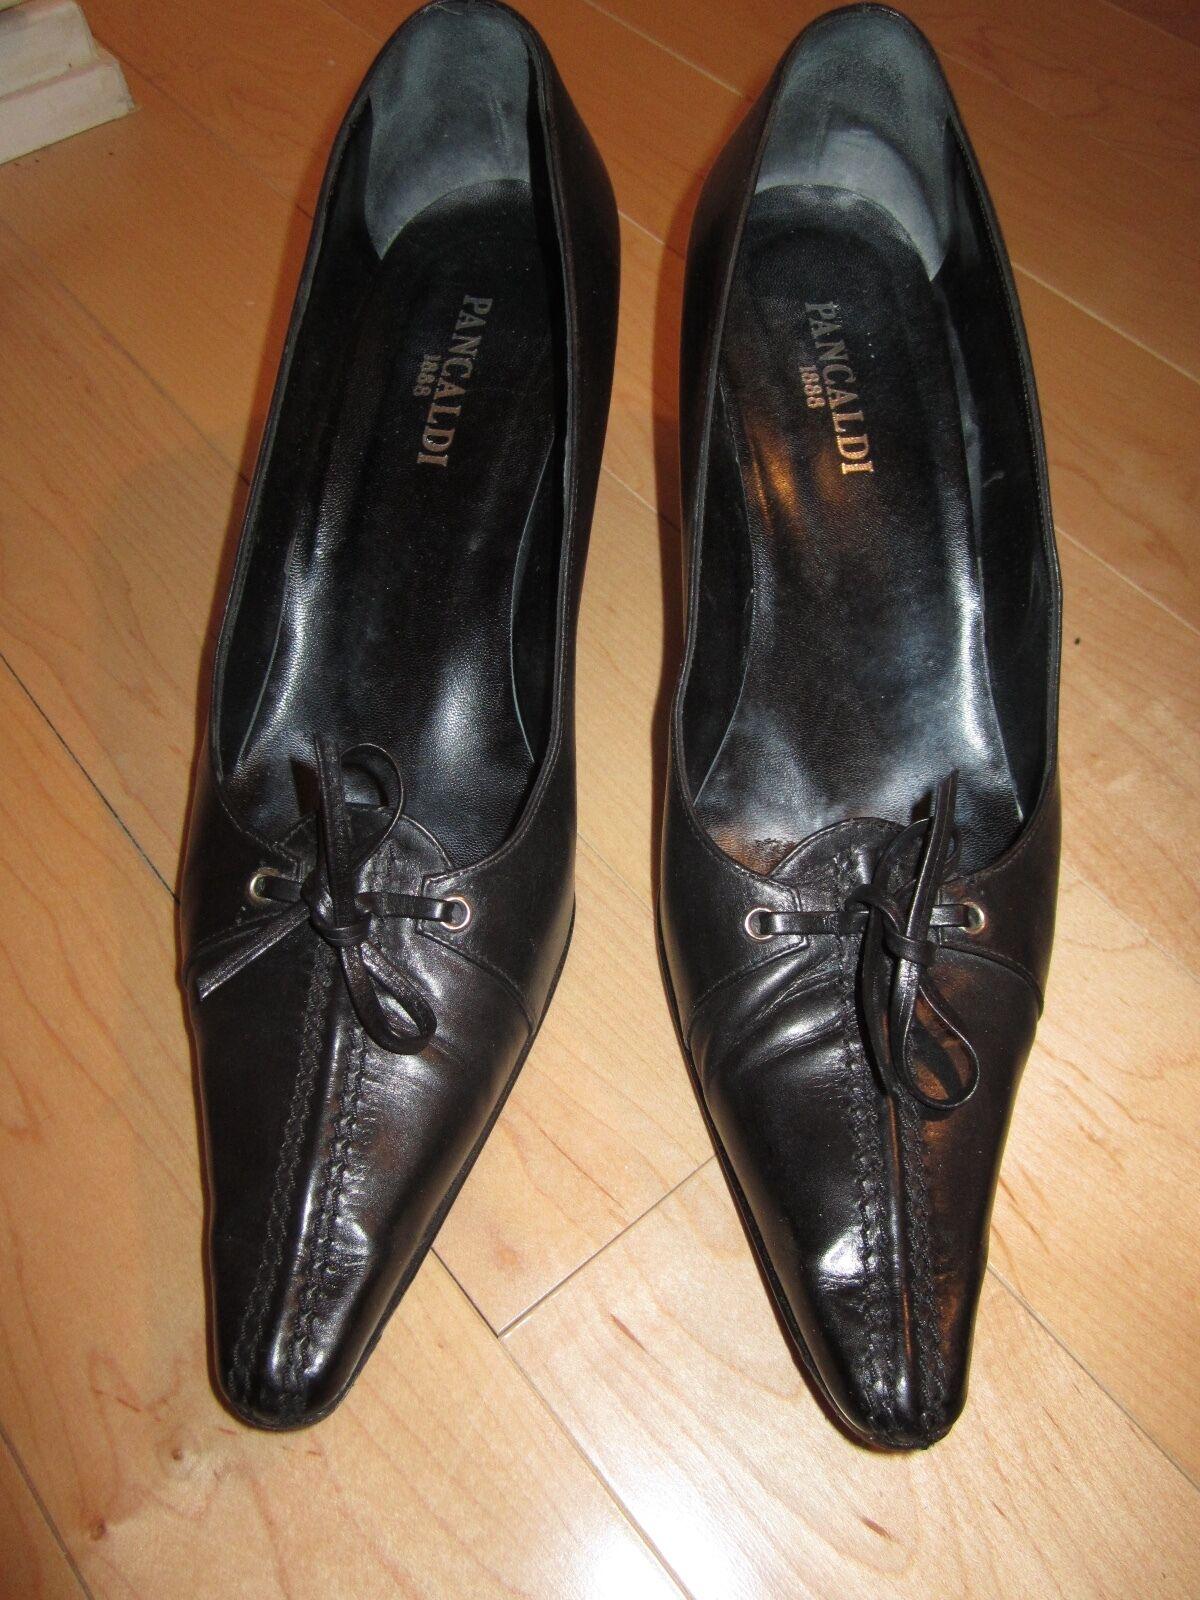 sconto online di vendita Pancaldi nero Leather Pump with lace up detail detail detail Dimensione 10.5  prodotti creativi